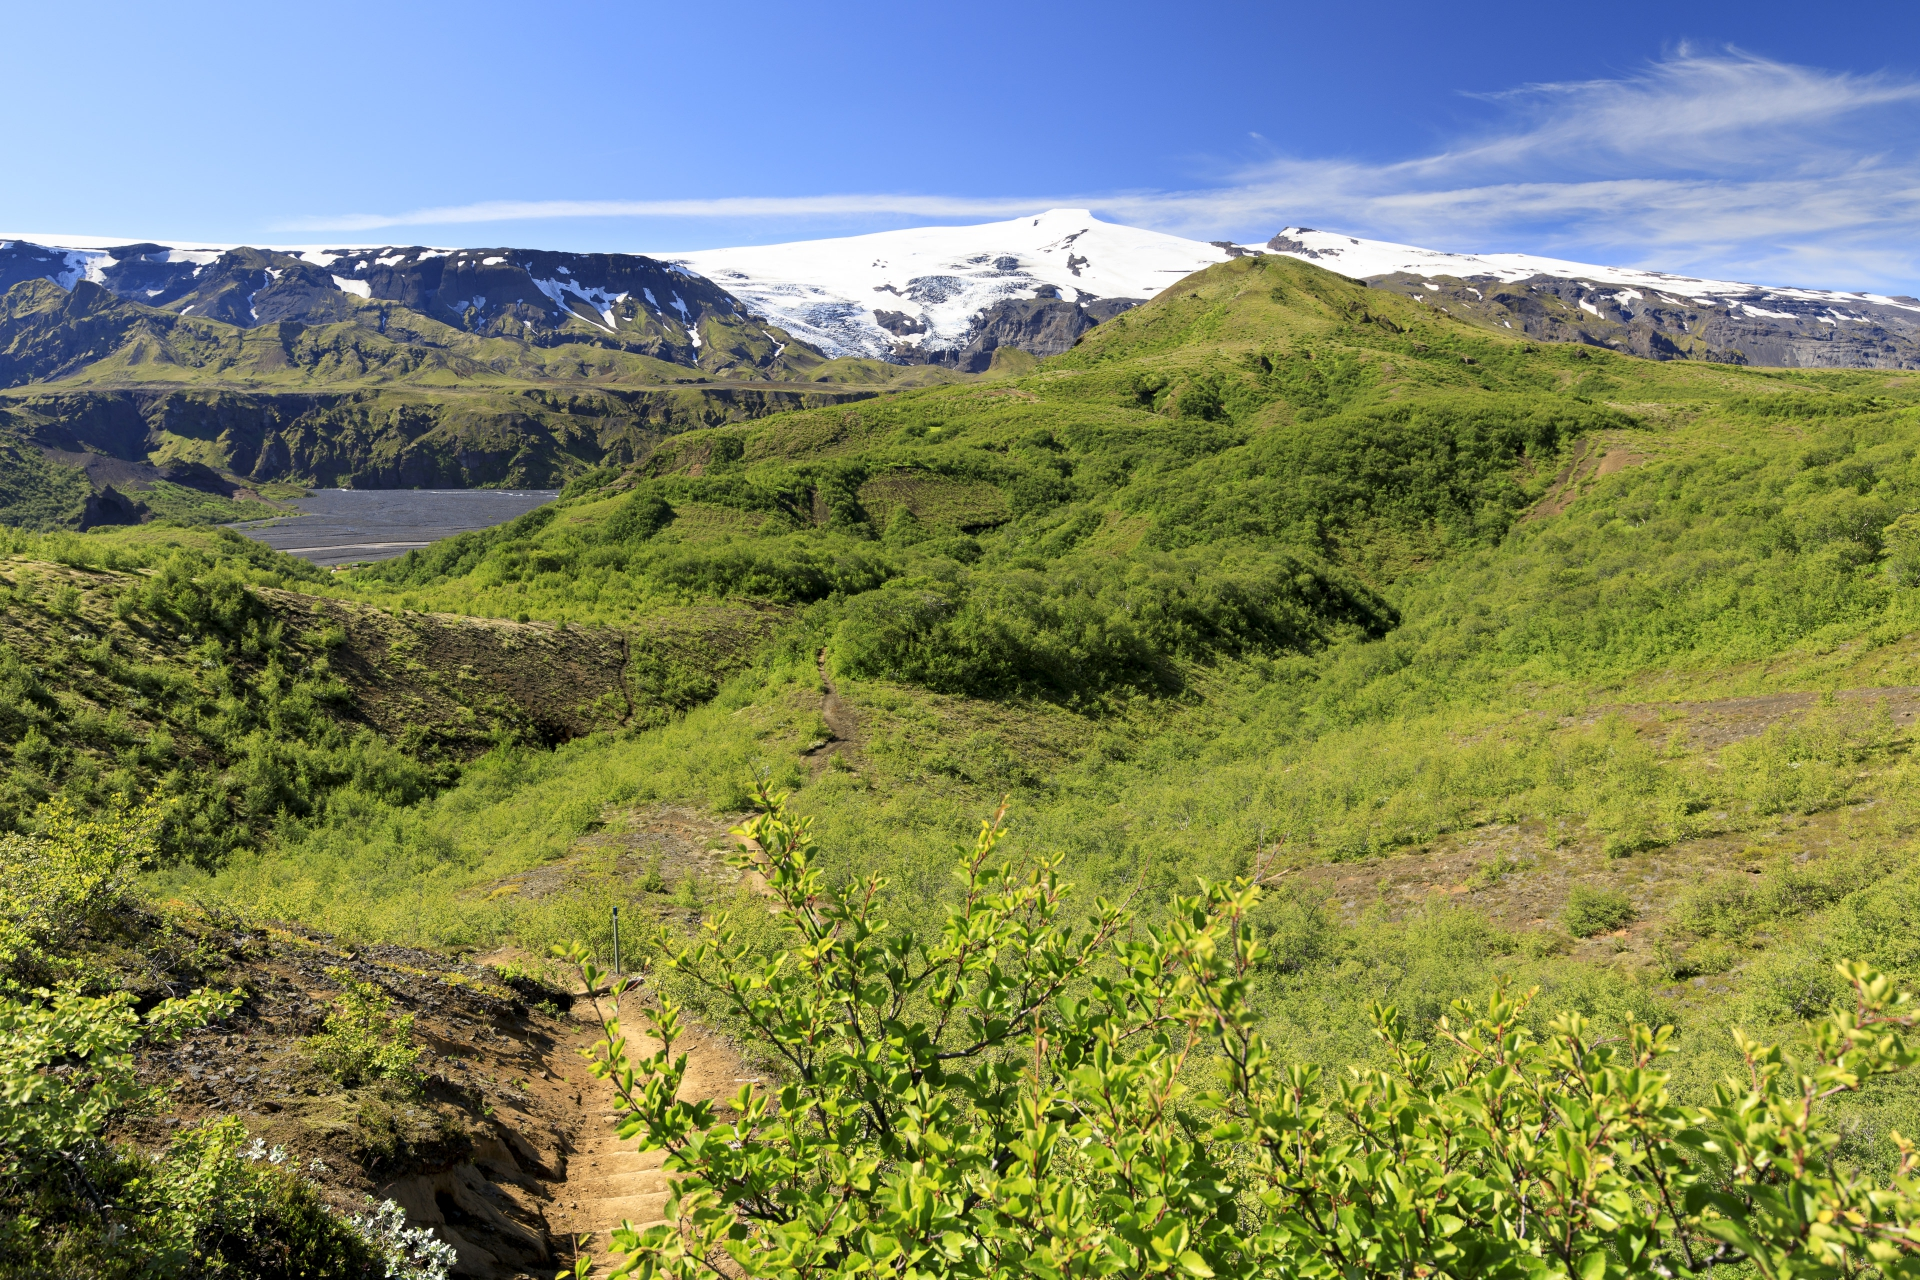 Þórsmörk, Krossá und Eyjafjallajökull